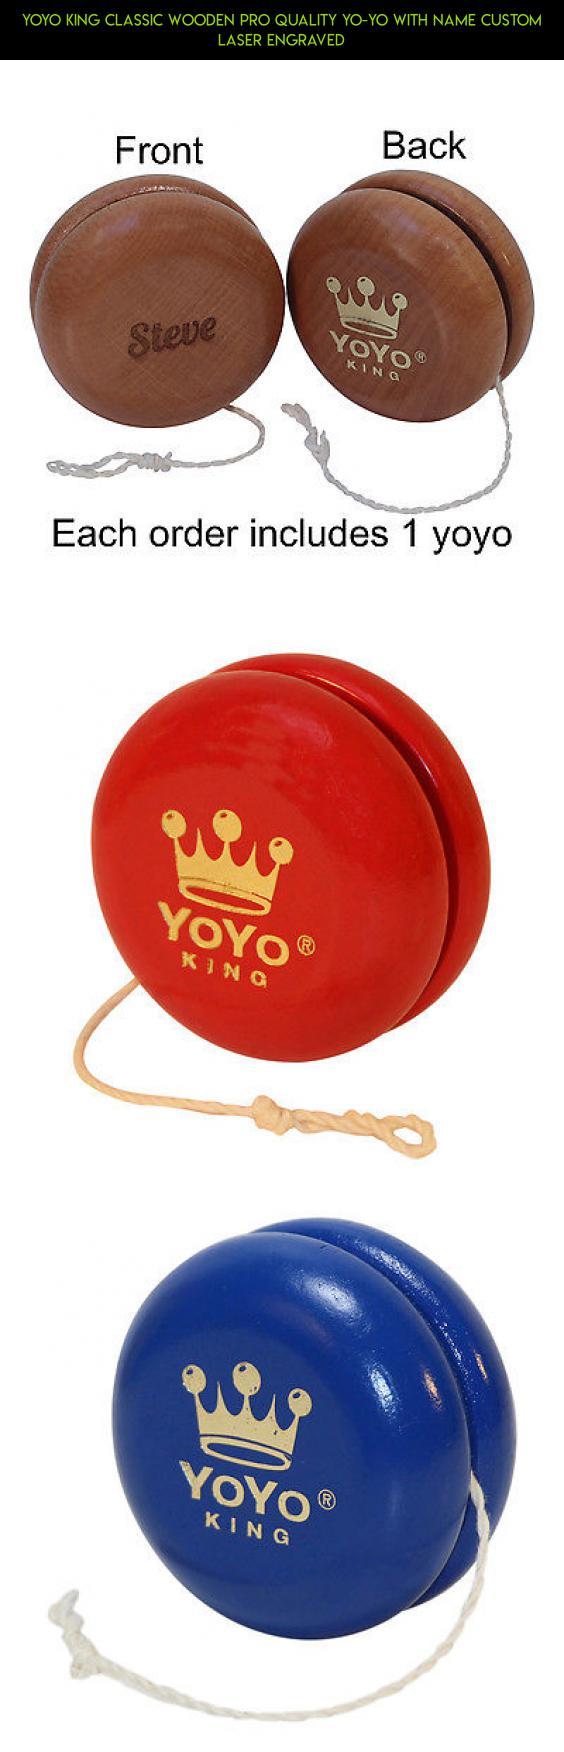 yoyo king classic wooden pro quality yo-yo with name custom